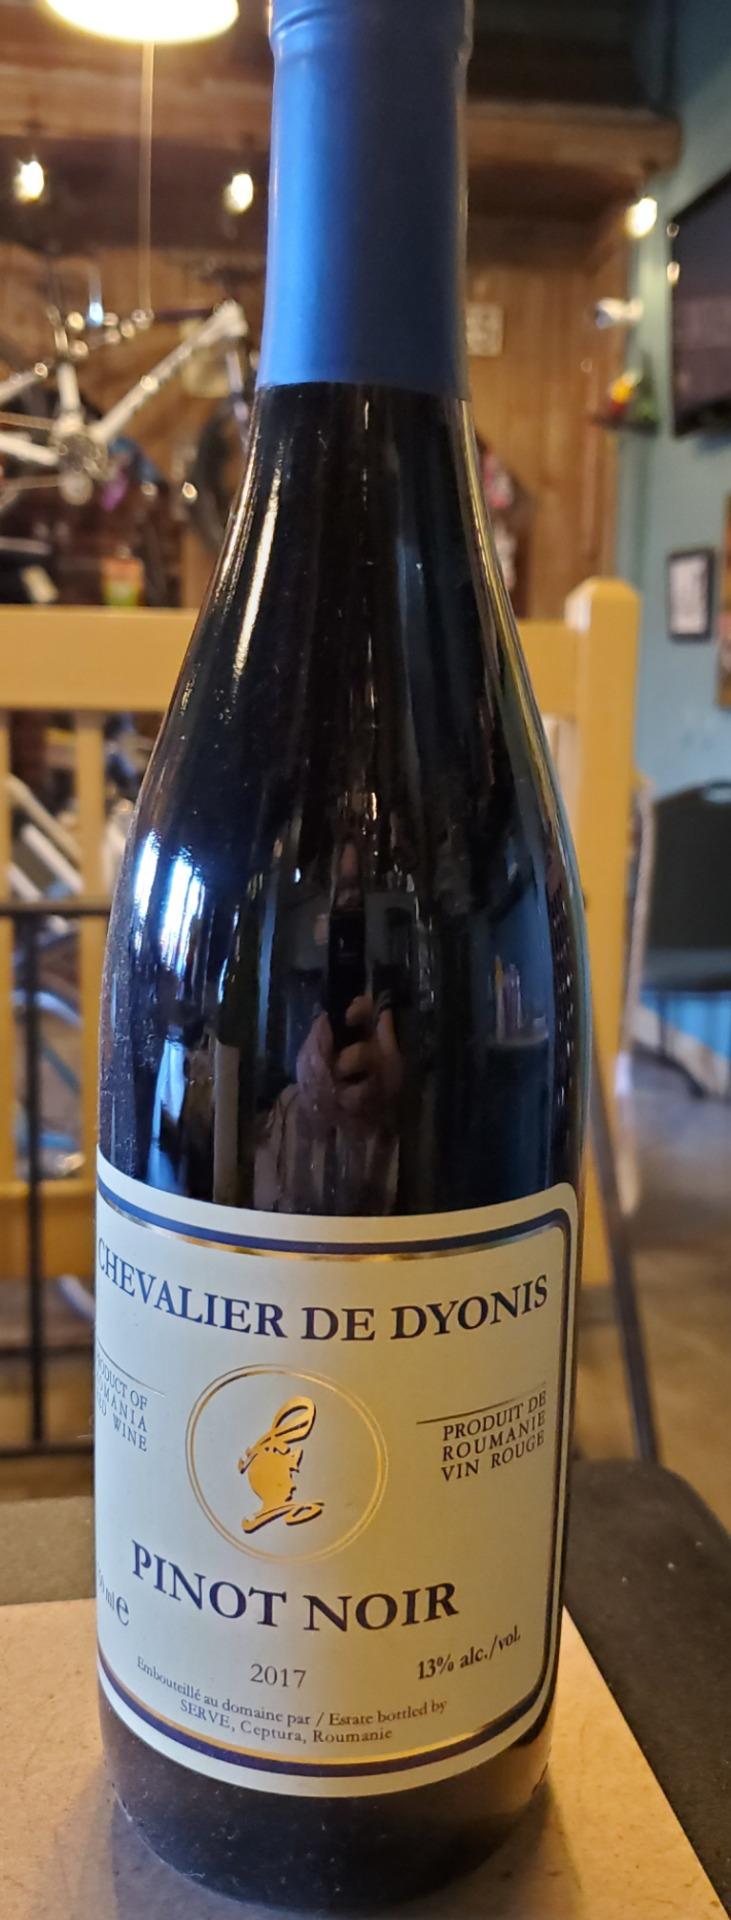 Bottle Pinot Noir Image